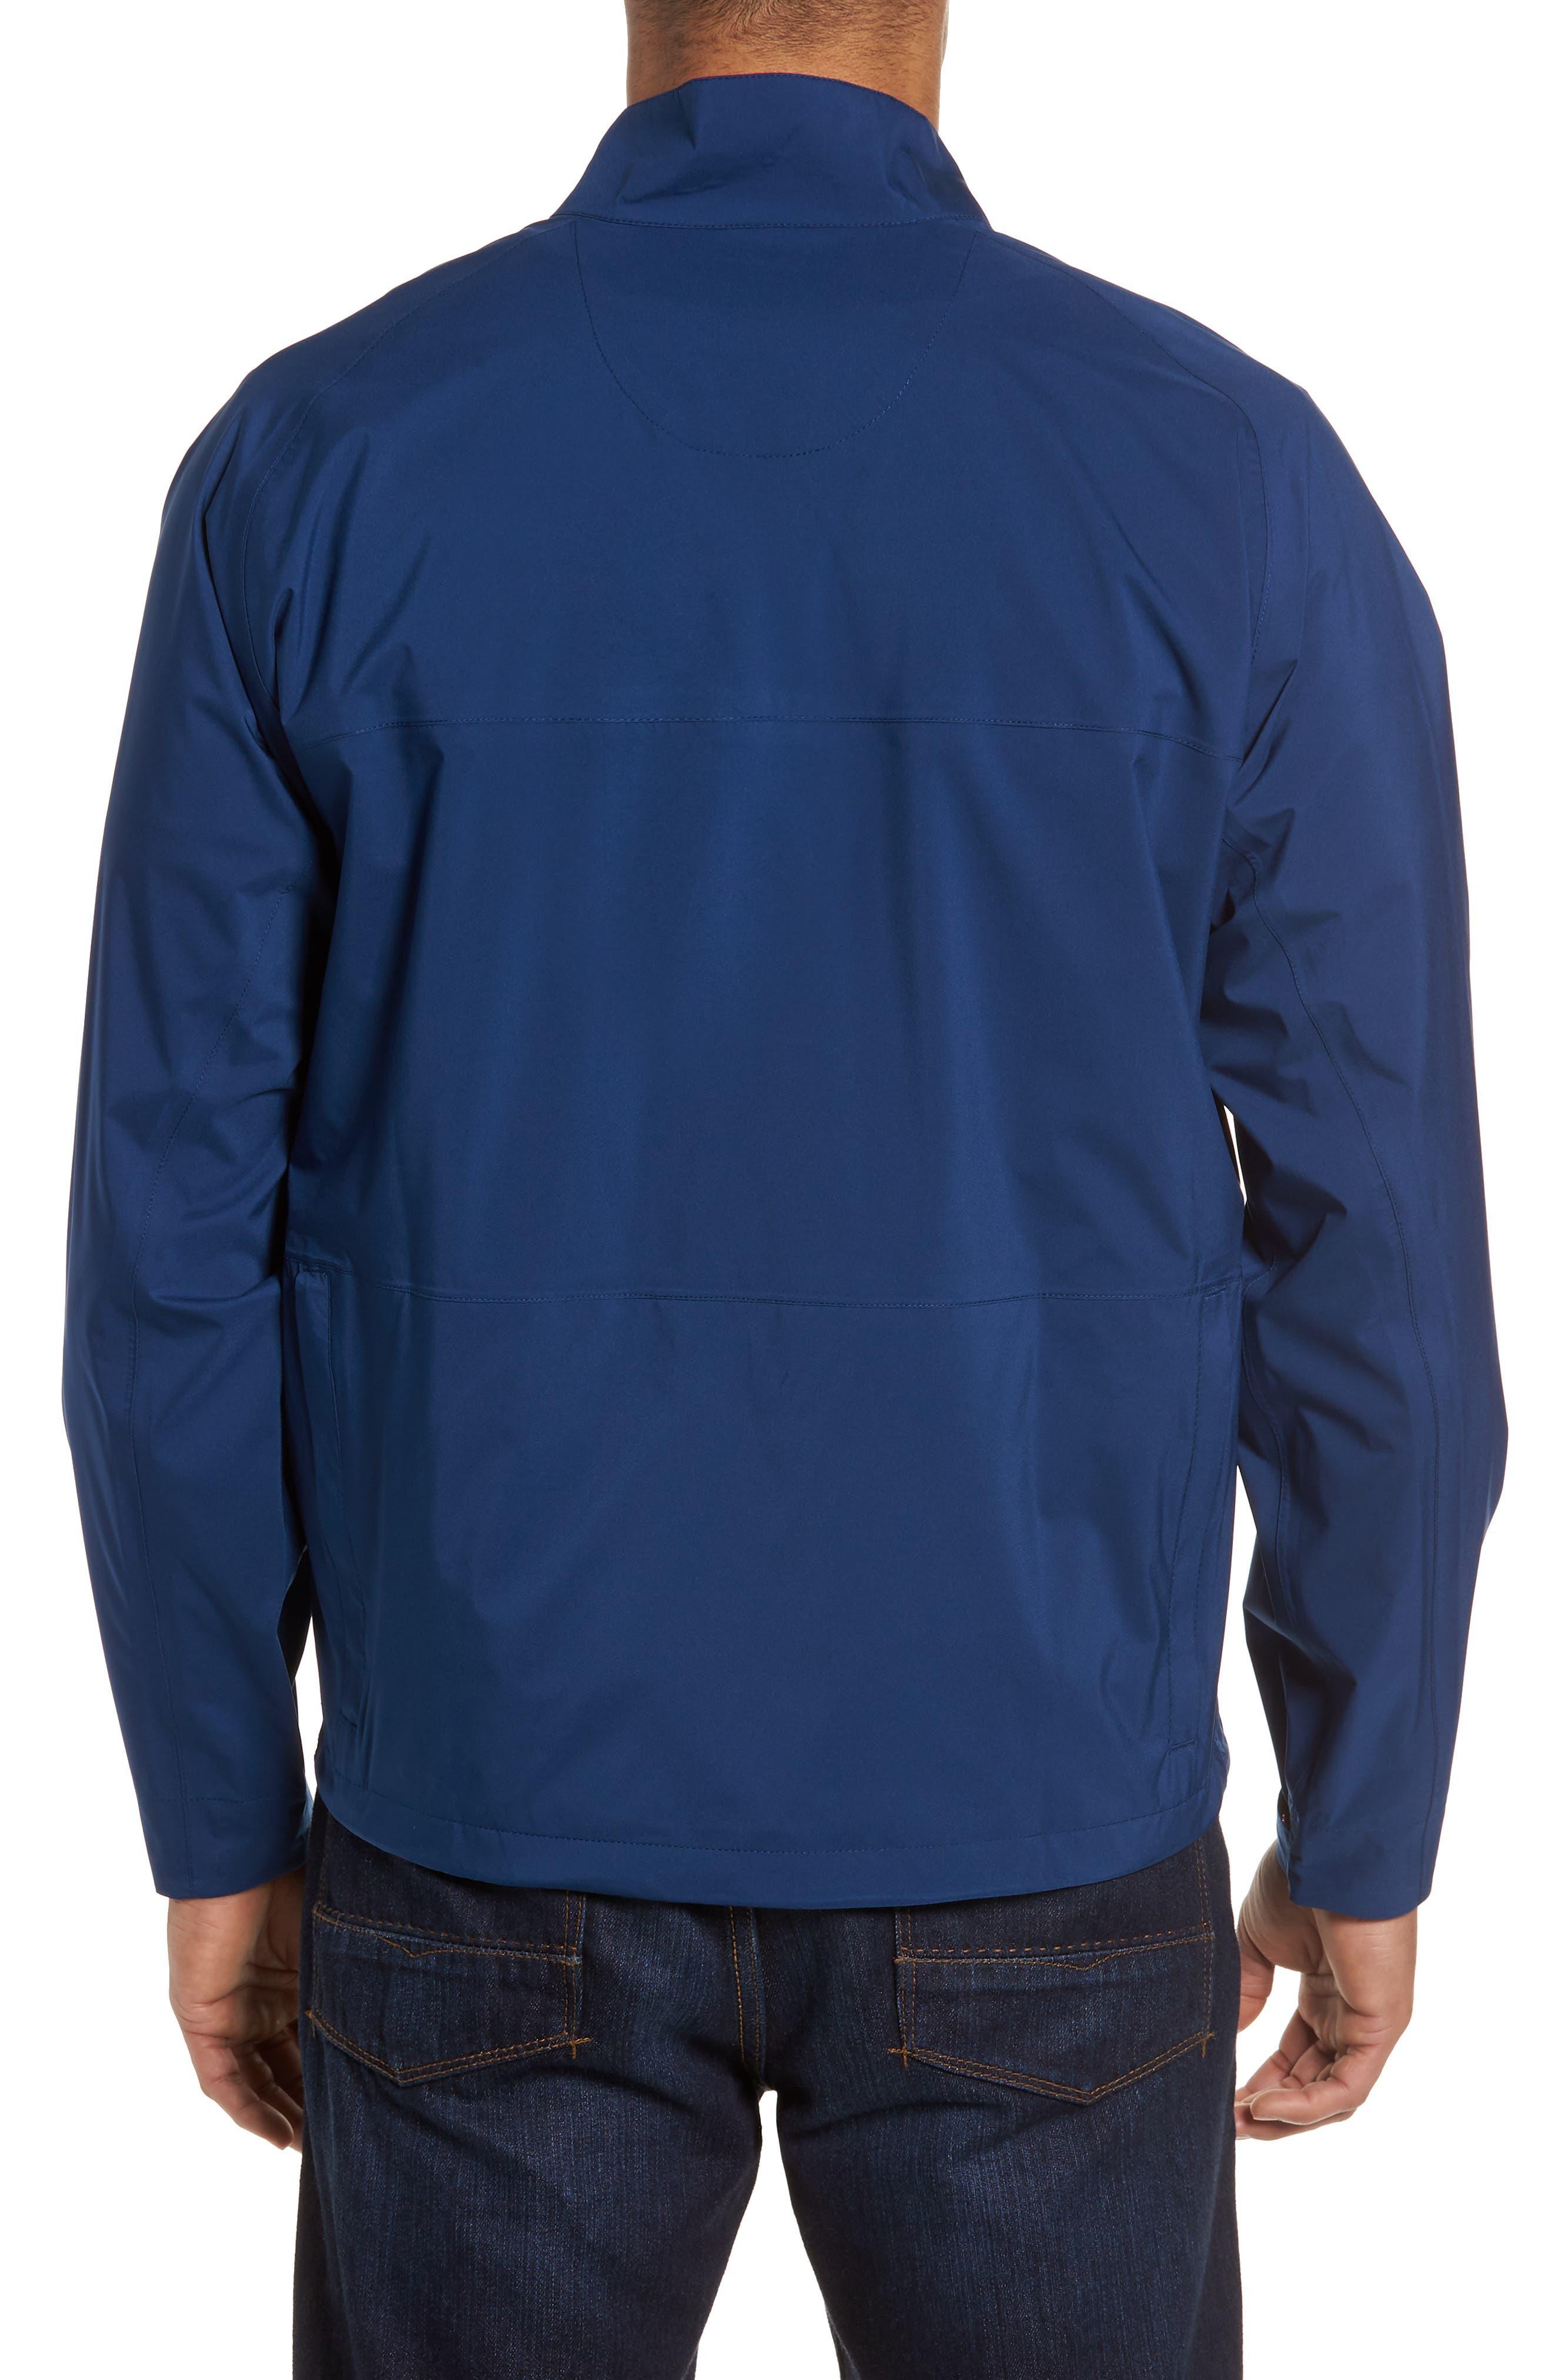 Regular Fit Half Zip Performance Pullover,                             Alternate thumbnail 2, color,                             Navy